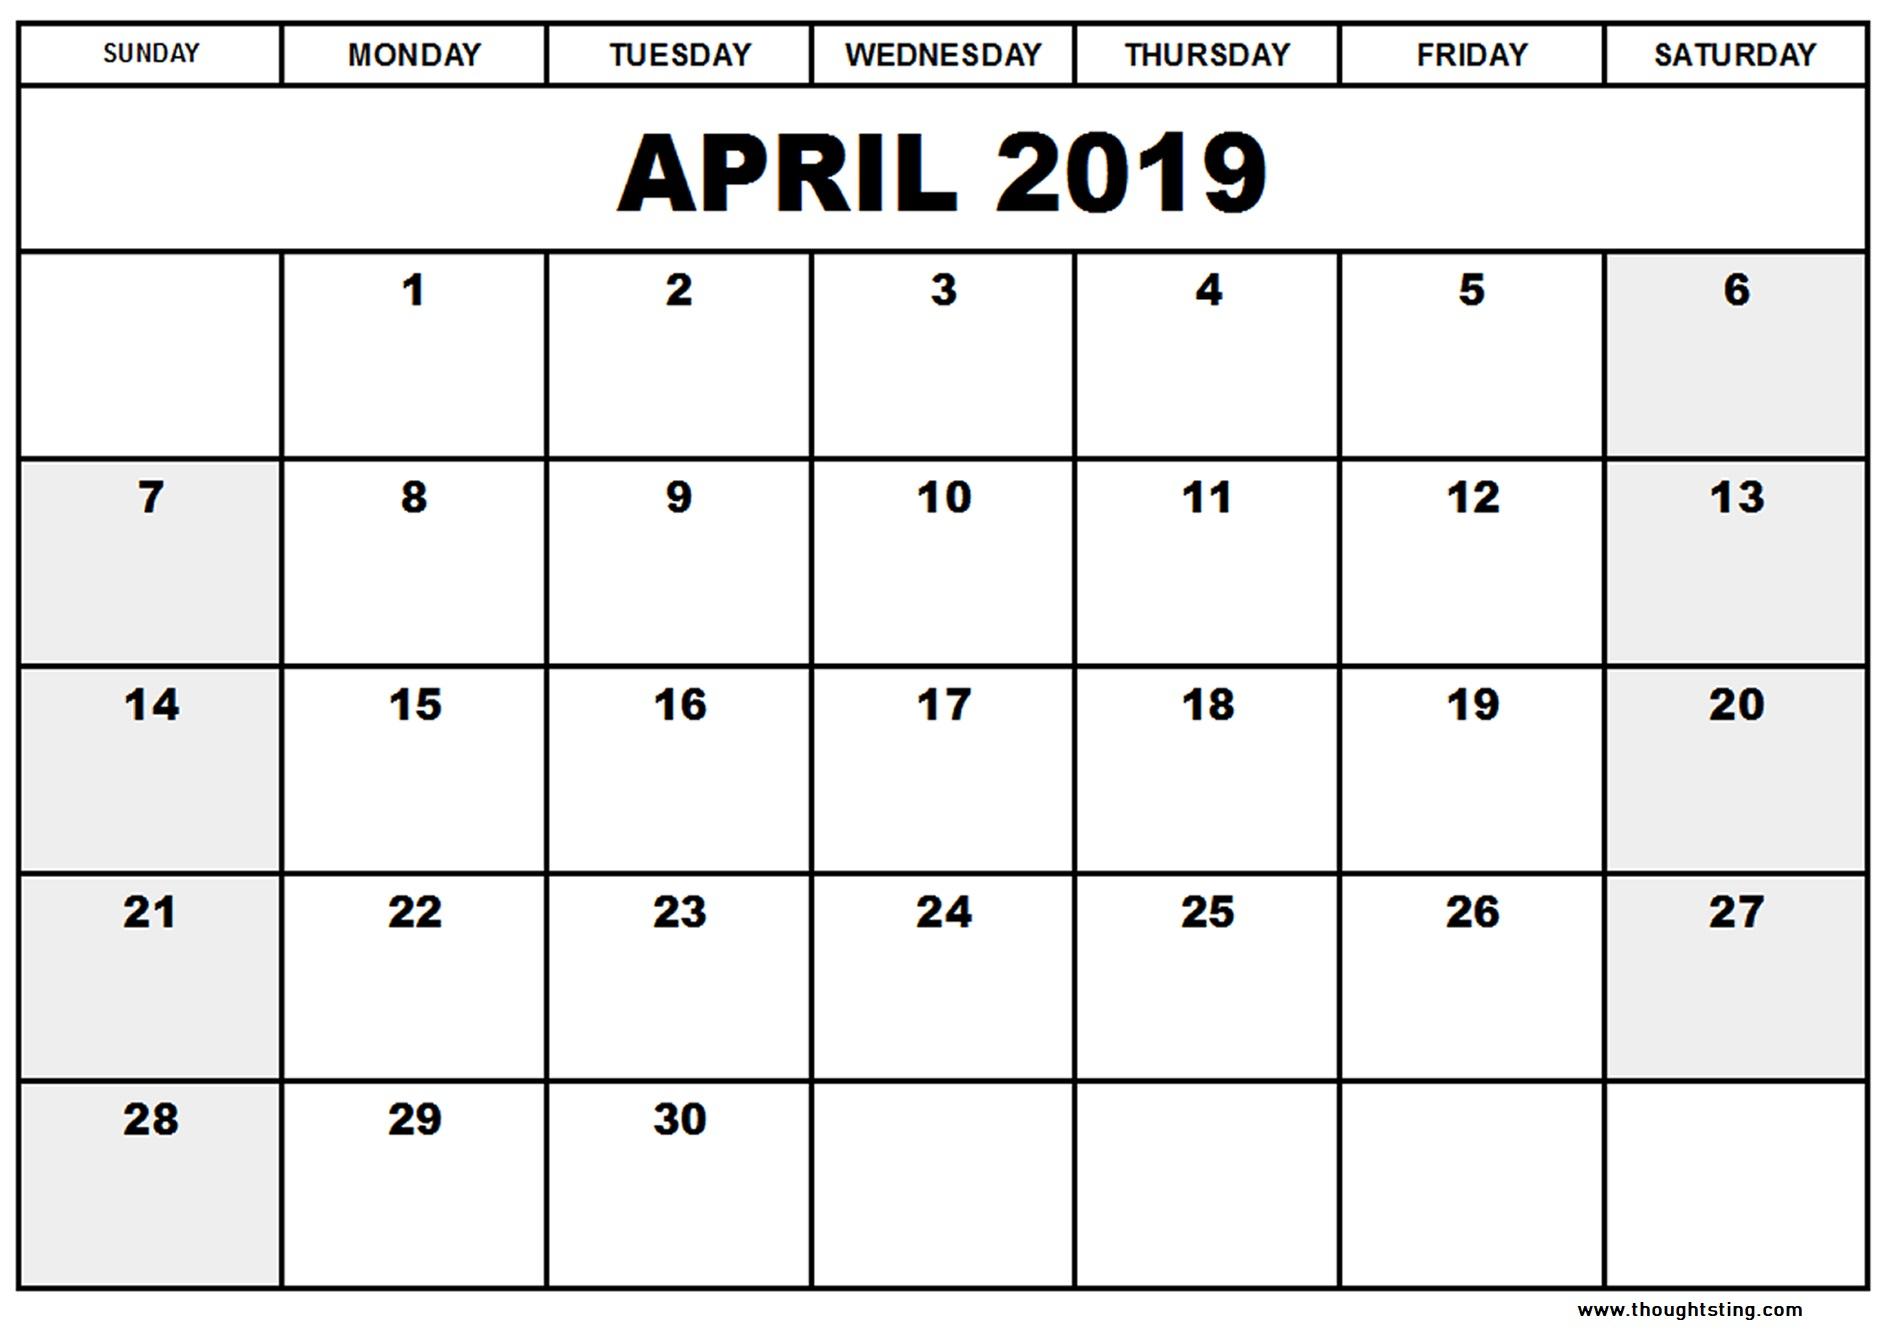 April 2019 Calendar Template Word, Excel, Pdf - Free Printable within Word Calendar Template Excel